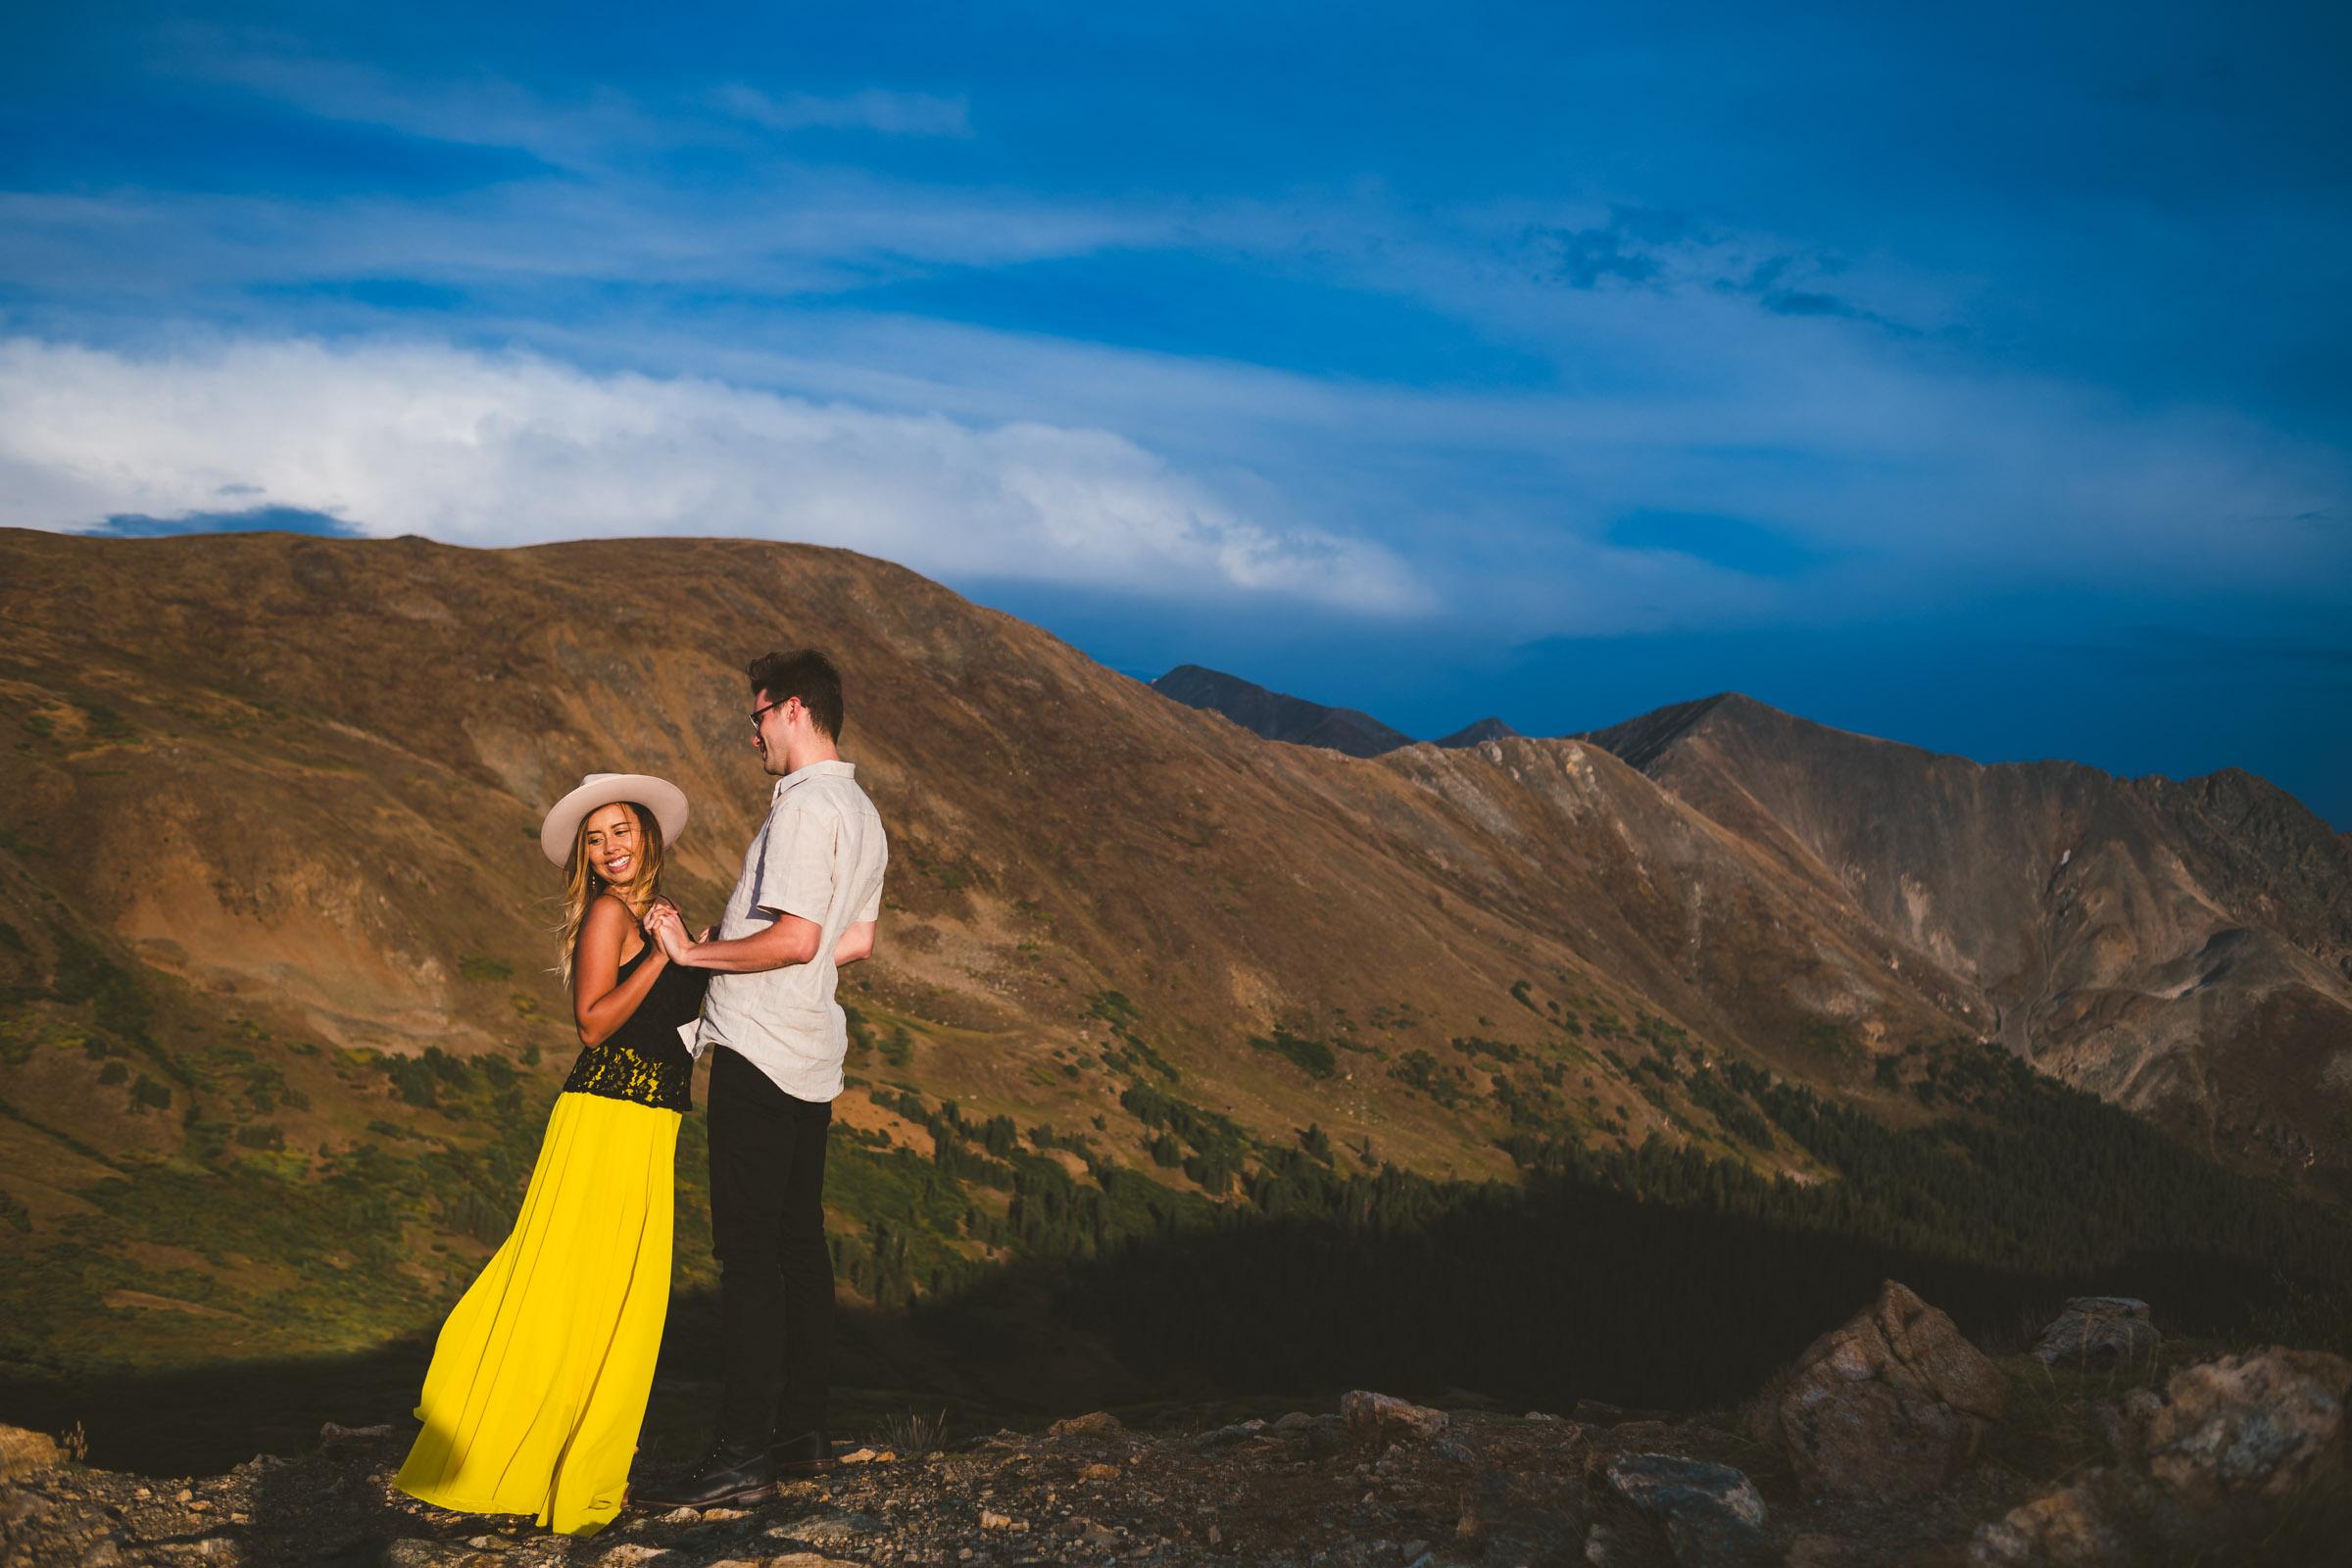 couplesadventurephotographer 9